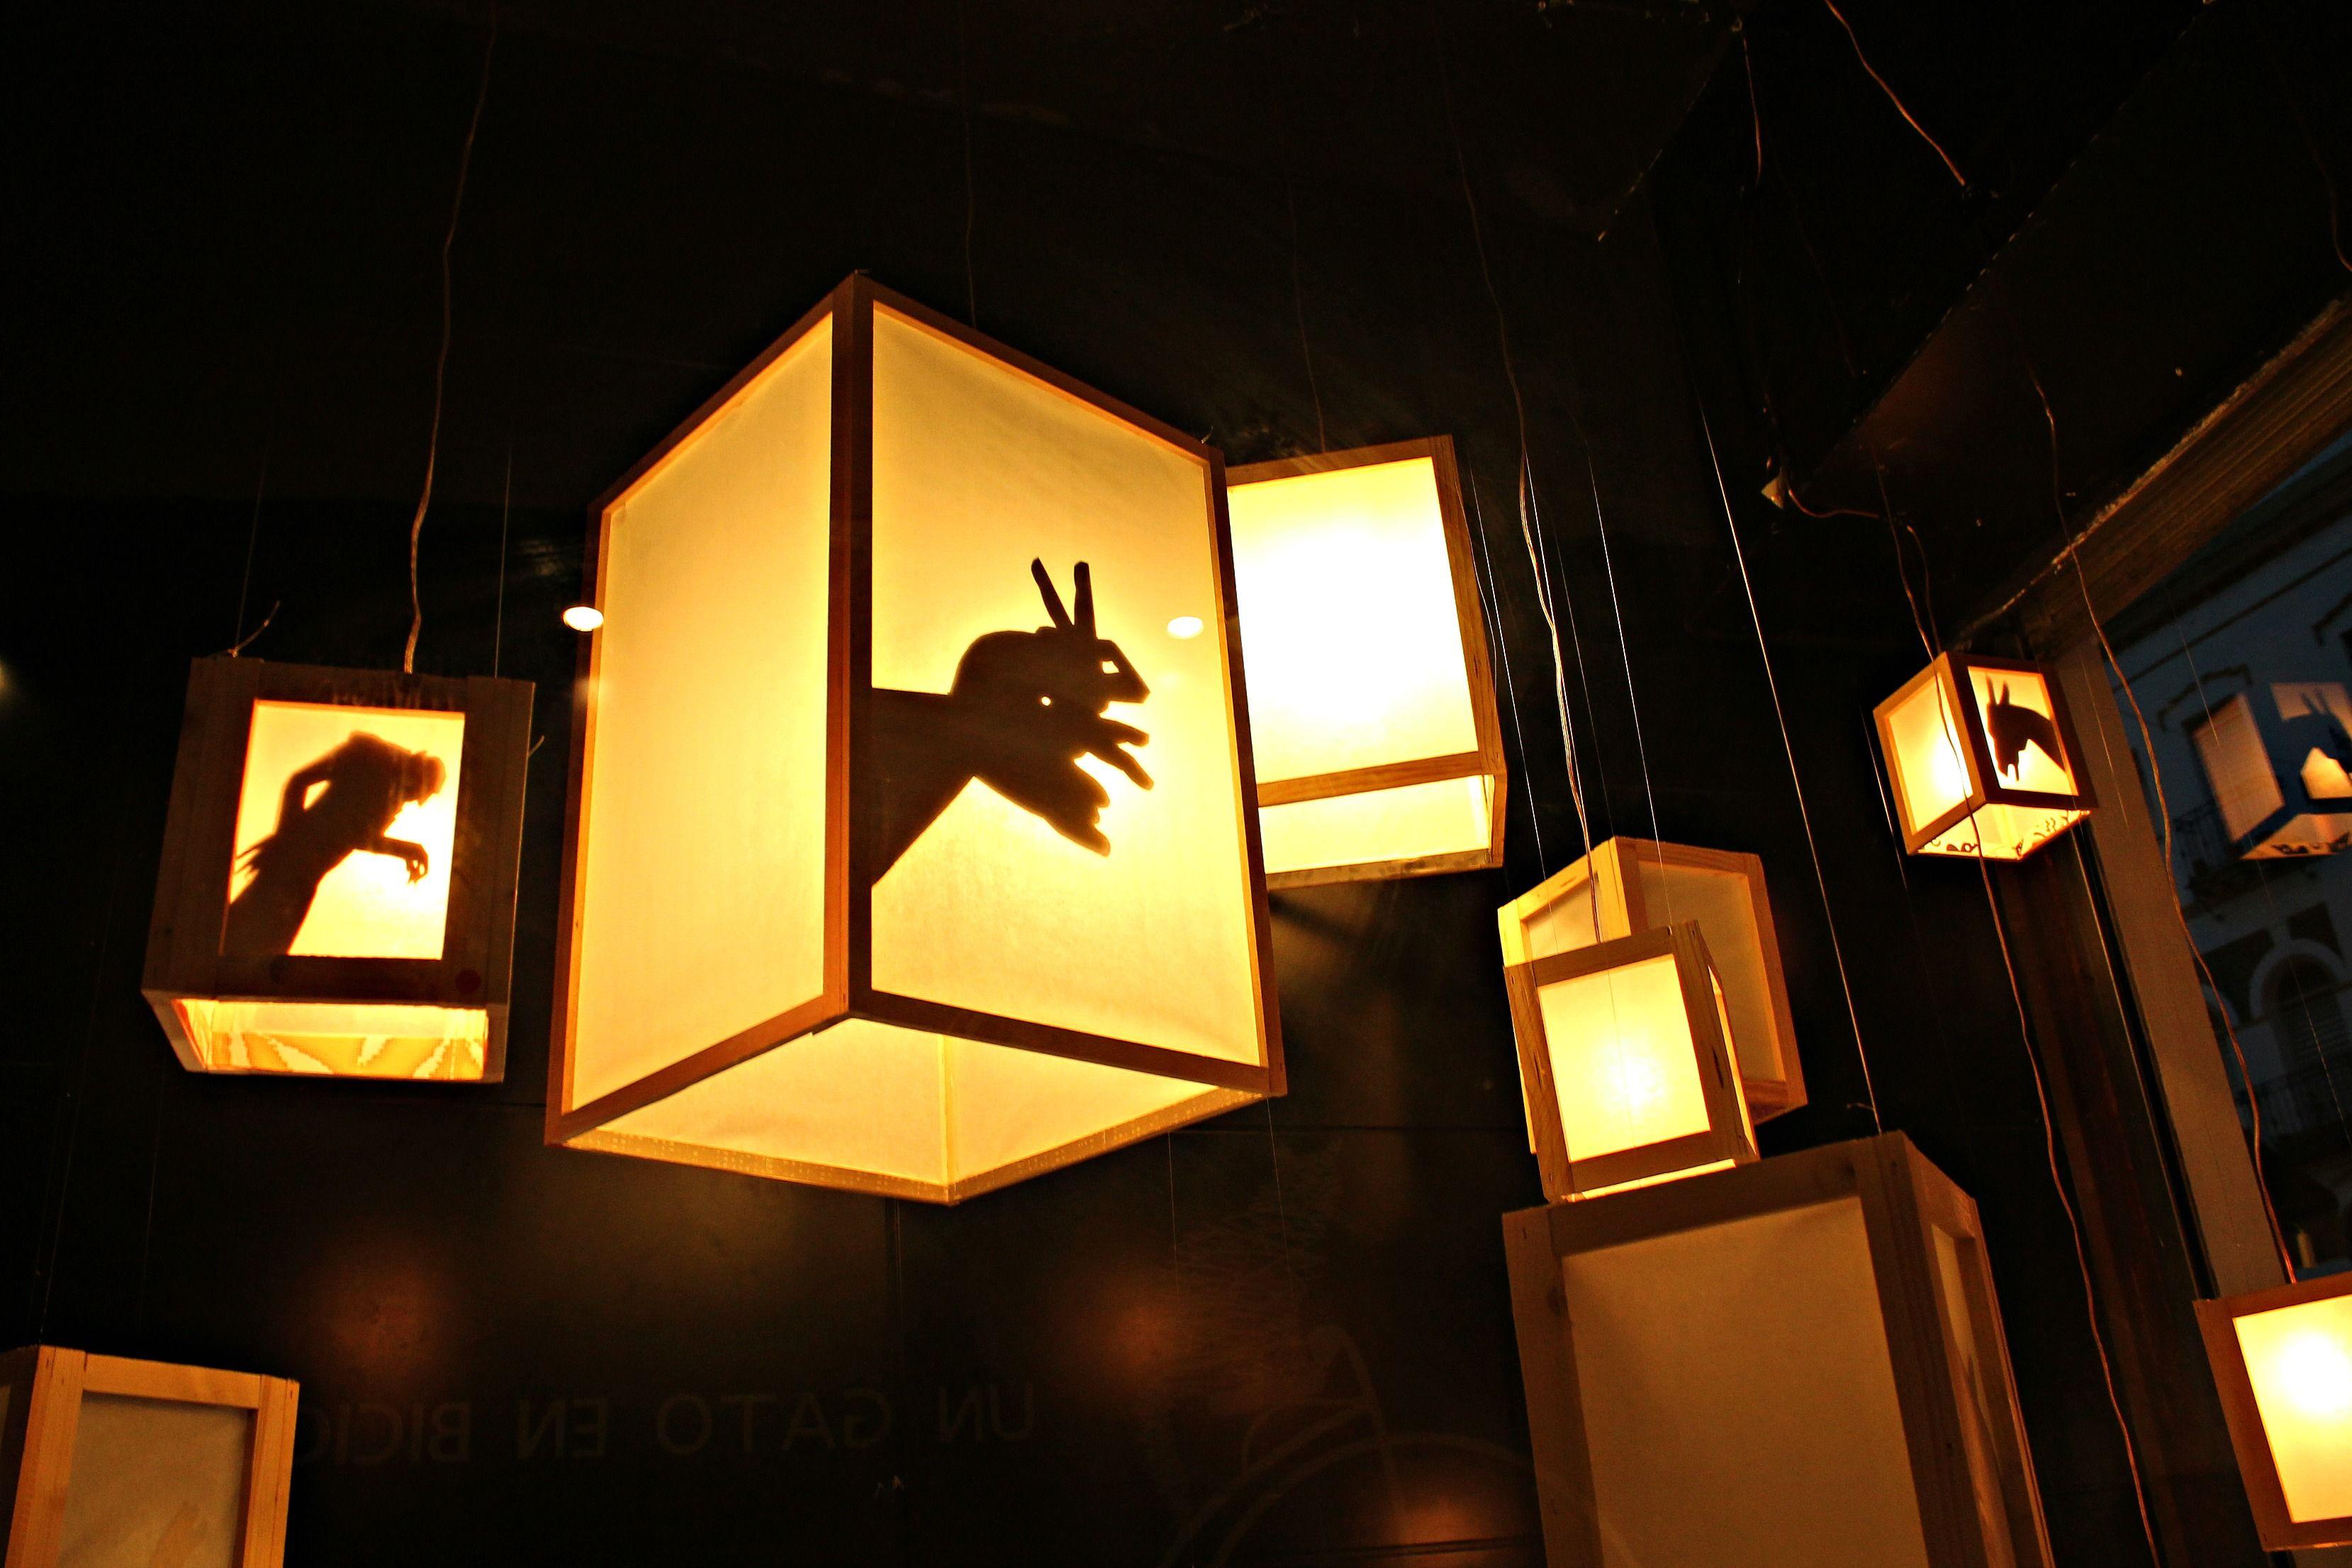 Artsy lamps